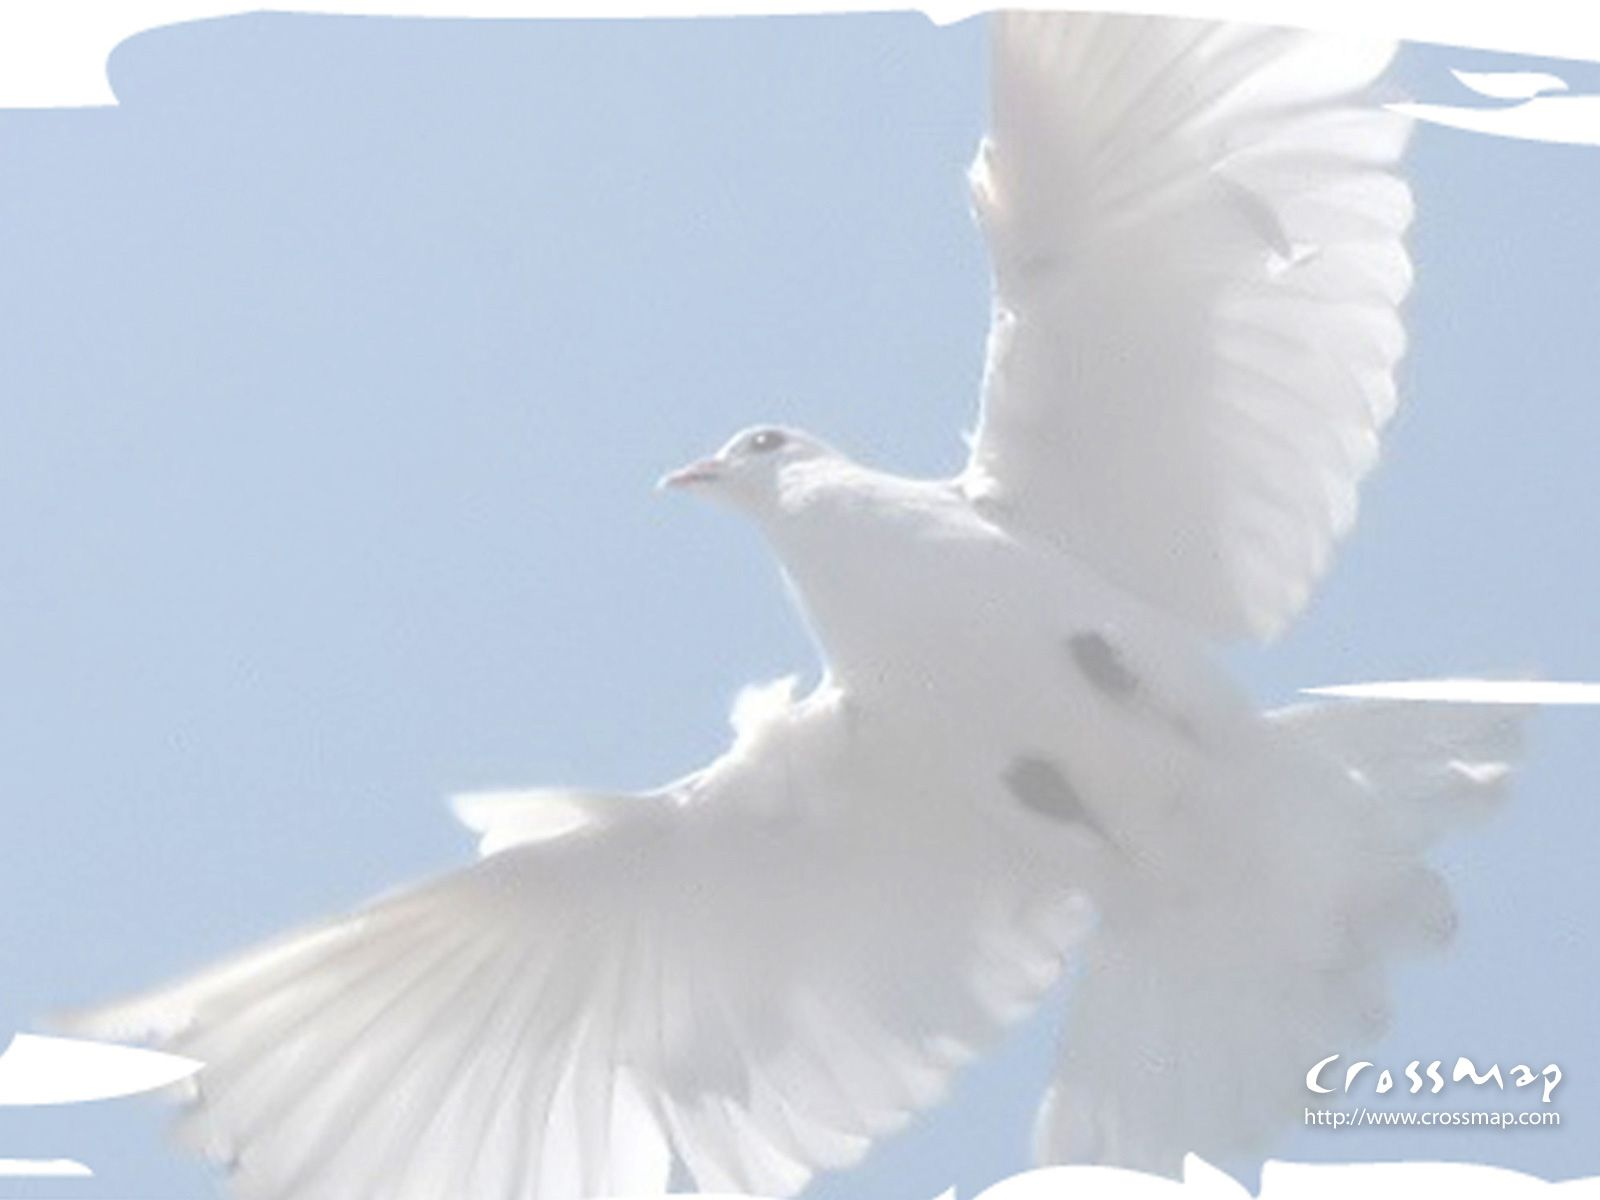 photos christian cross Spirit Dove 5 Crossmap Christian 1600x1200